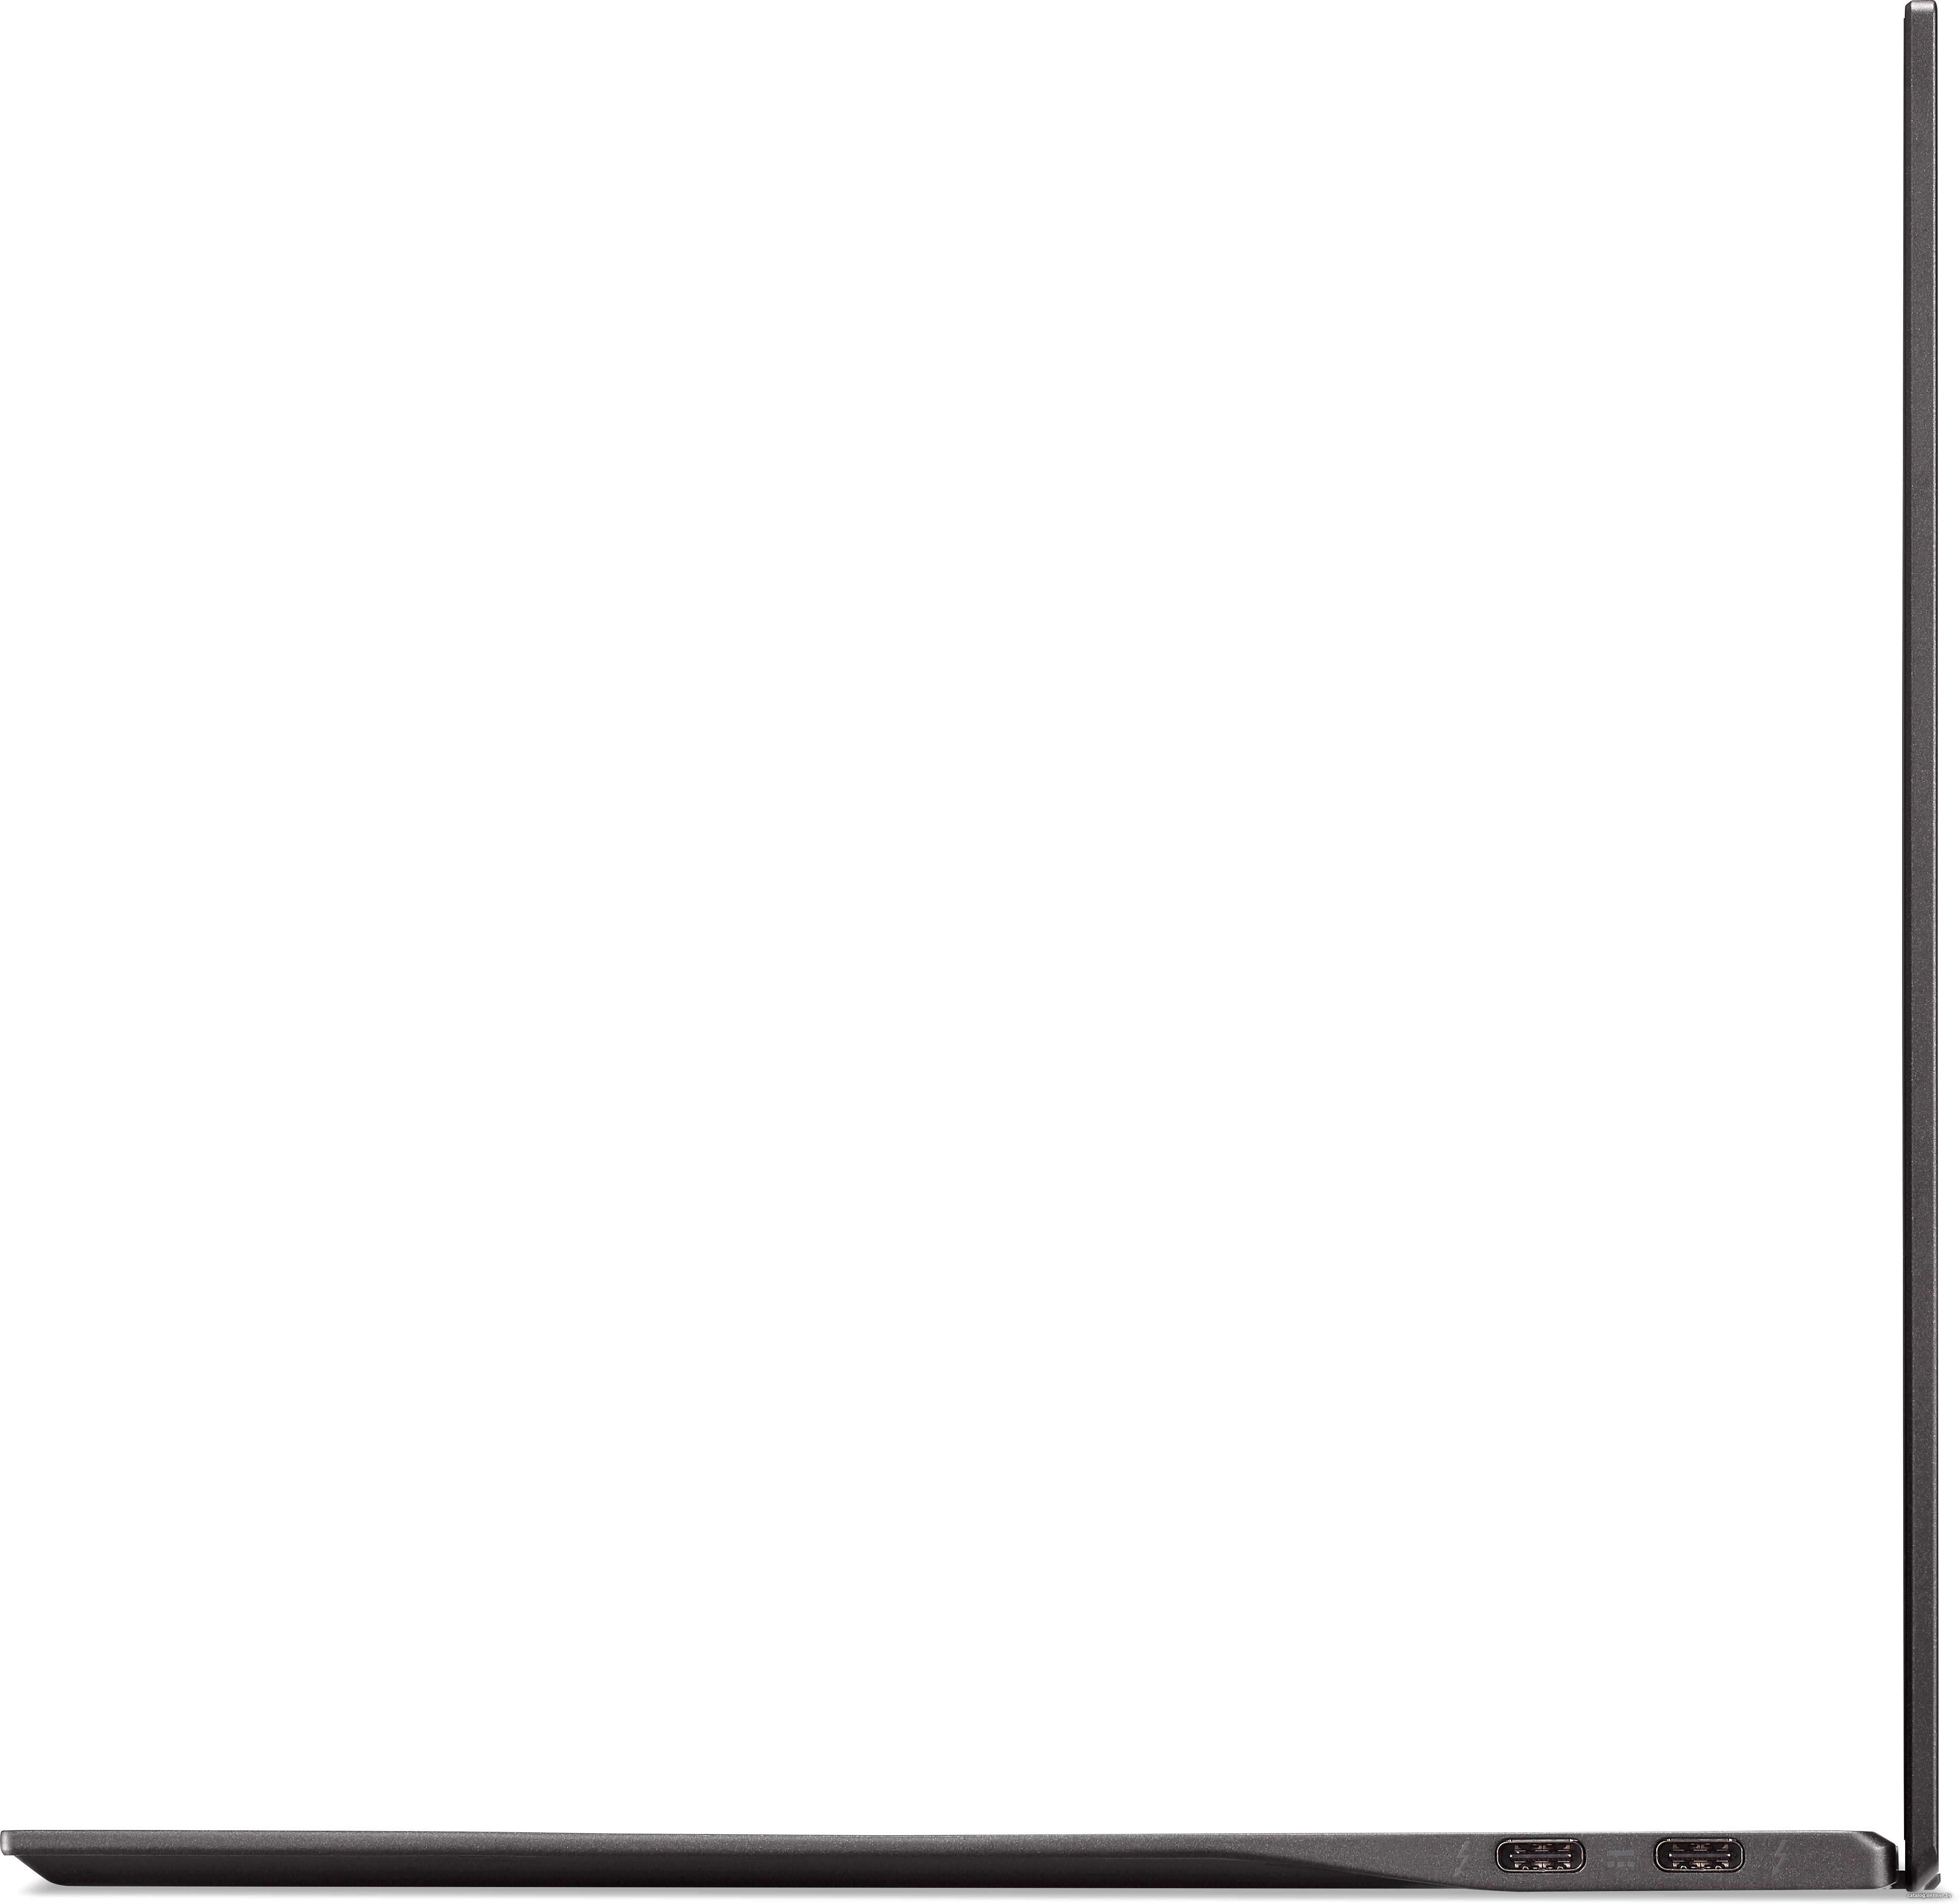 Acer Swift 7 SF714-52T-72EV NX.HB4EP.005 Image #3